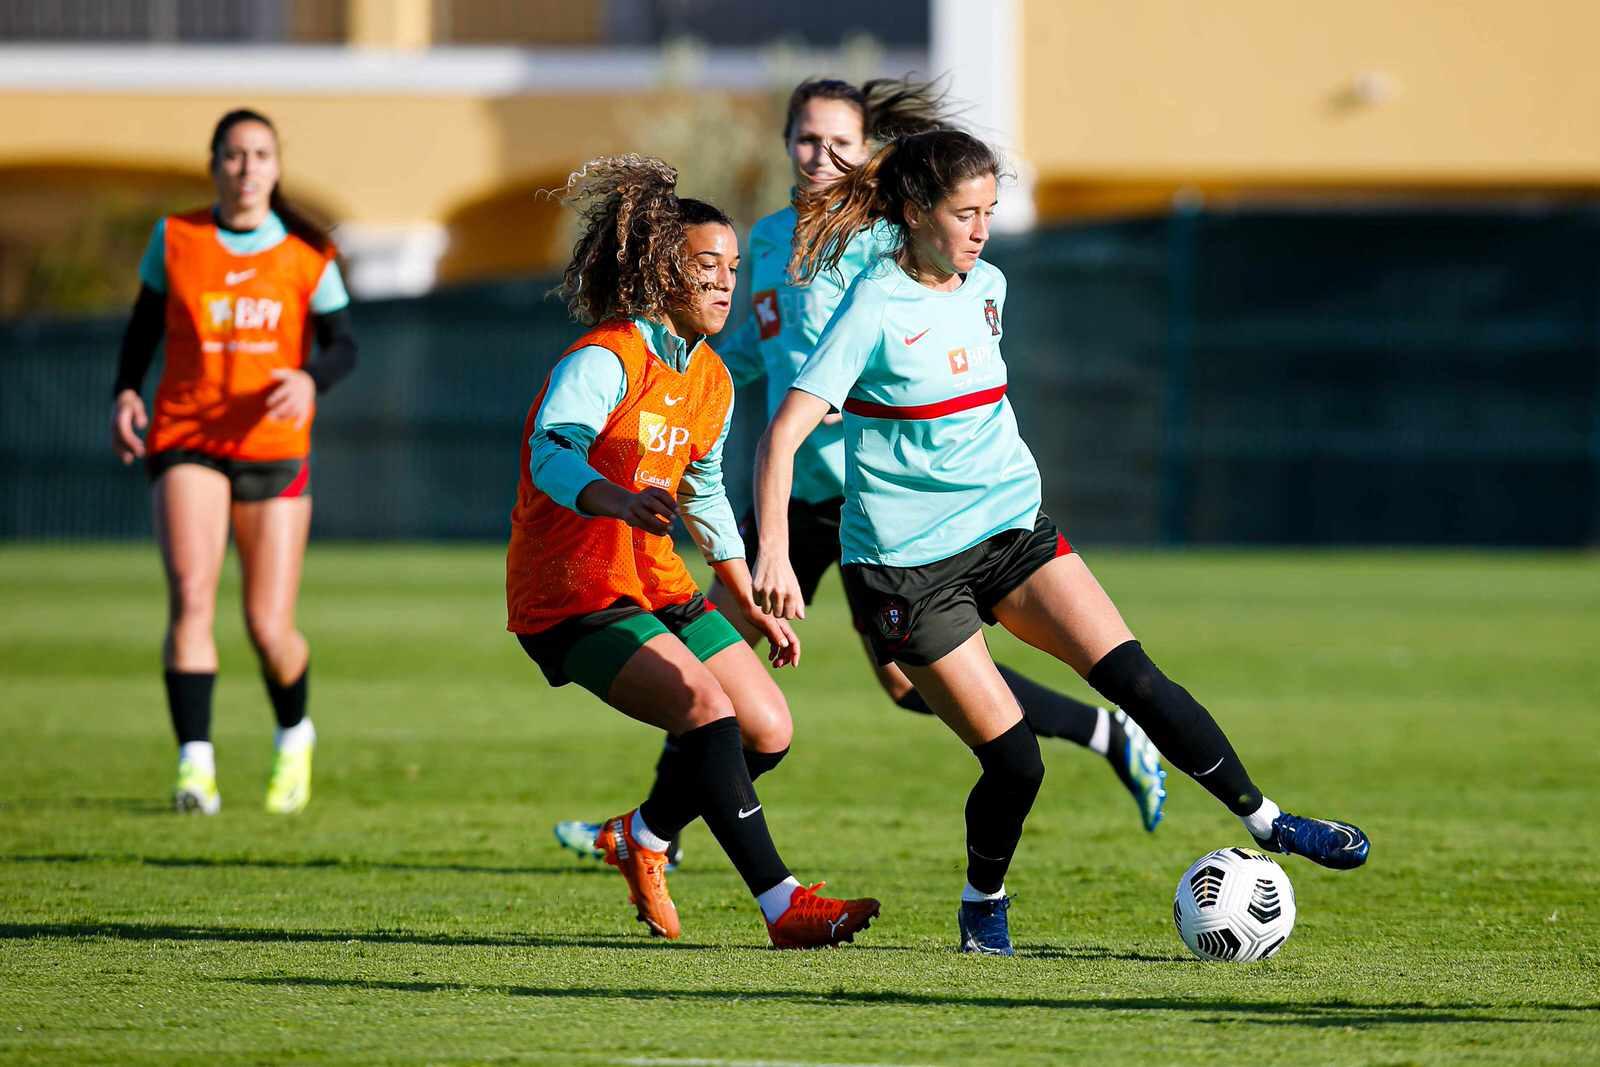 Portuguese women's football team has begun training in Lagos